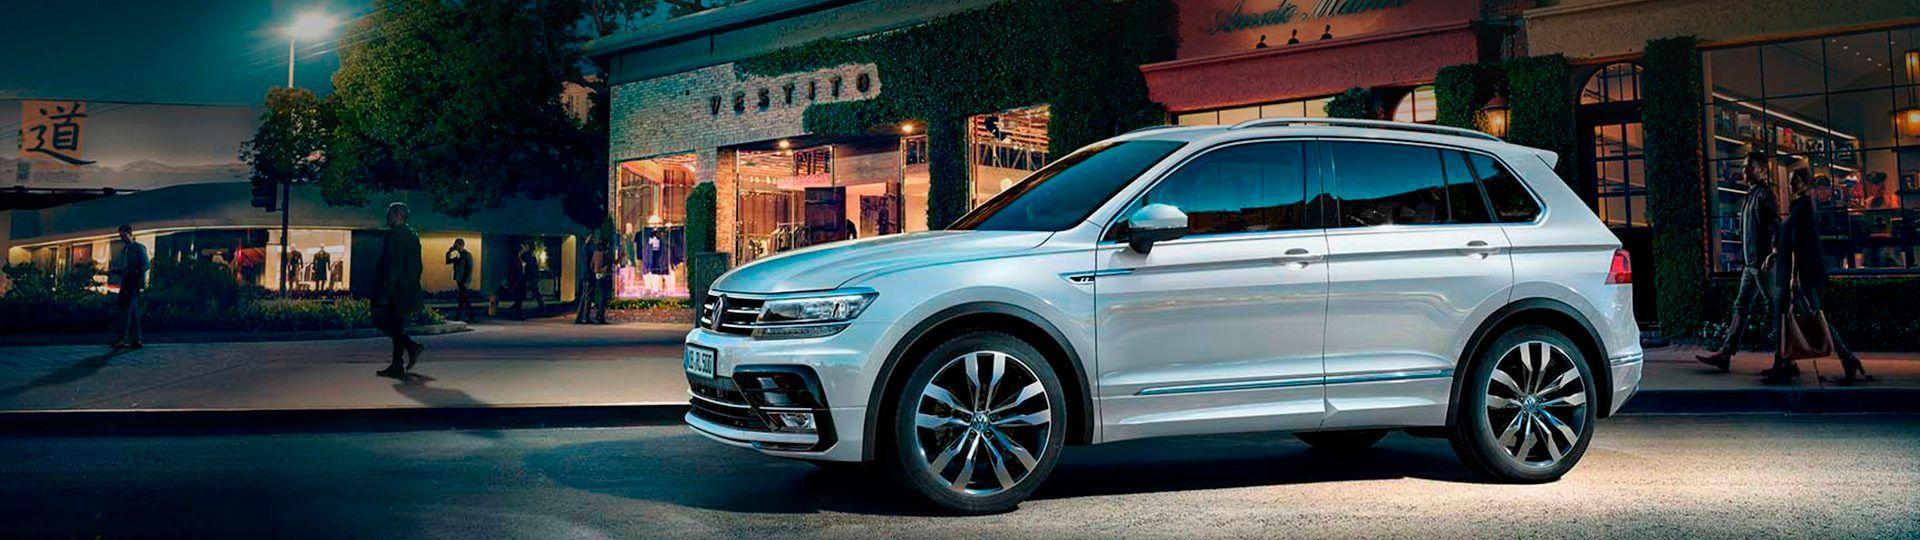 Centertorrent, Concesionario Oficial Volkswagen en Torrent (Valencia)